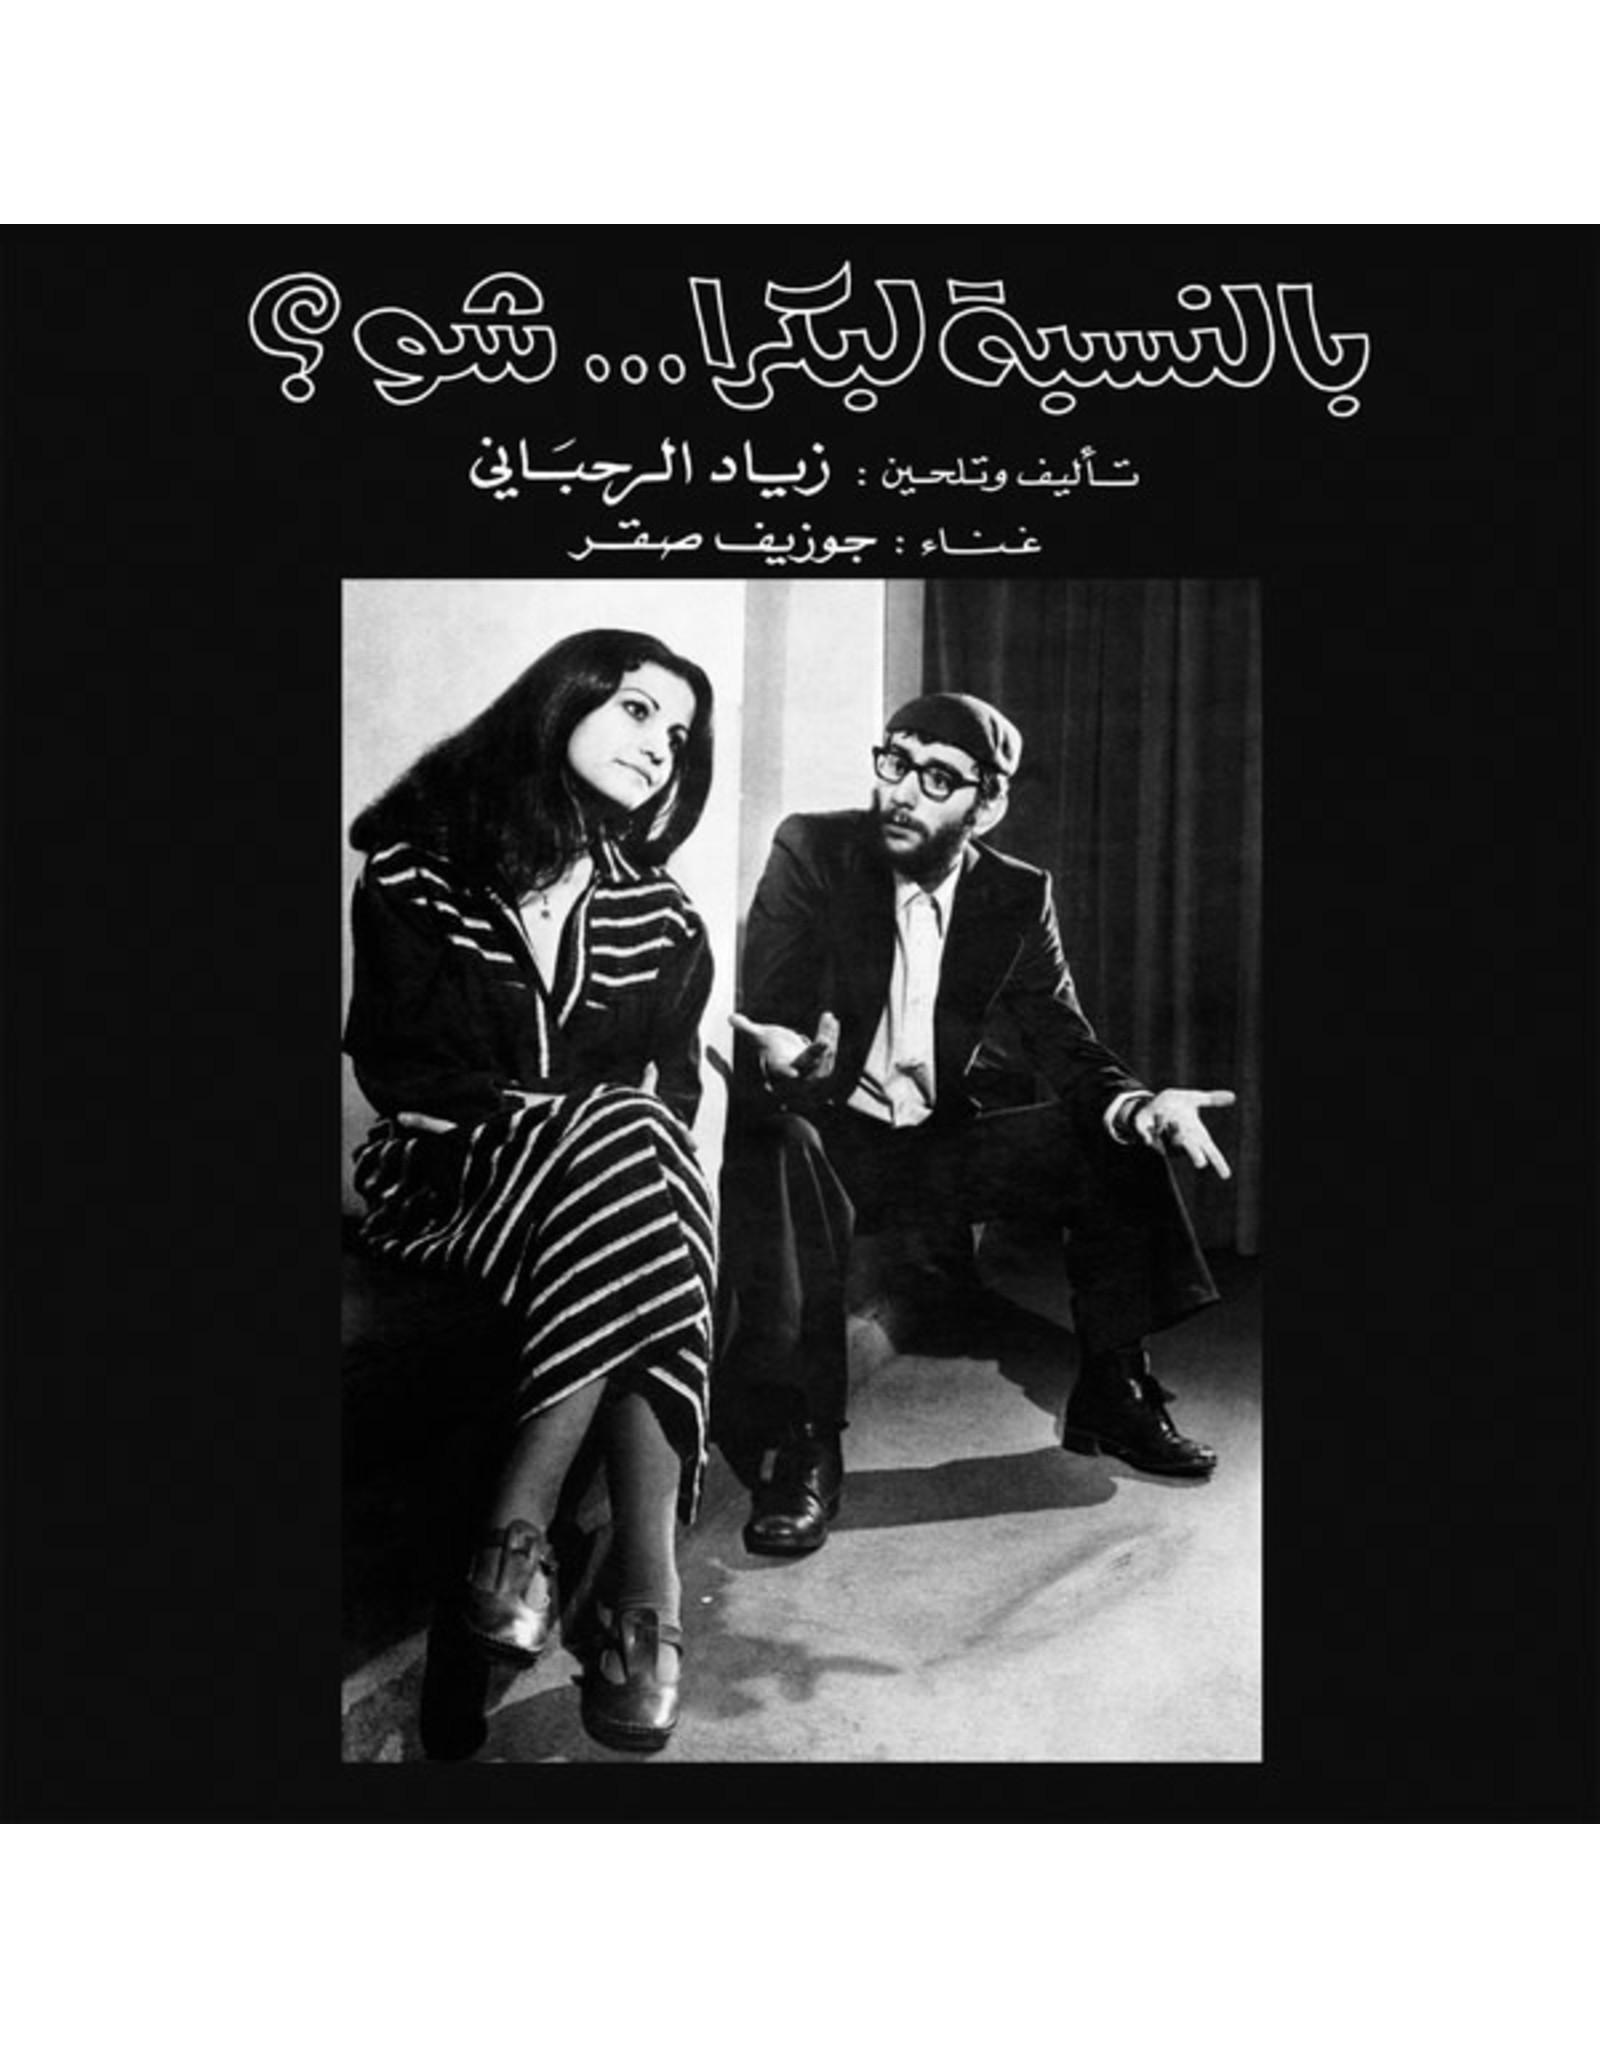 New Vinyl Ziad Rahbani - Bennesbeh Labokra... Chou? LP